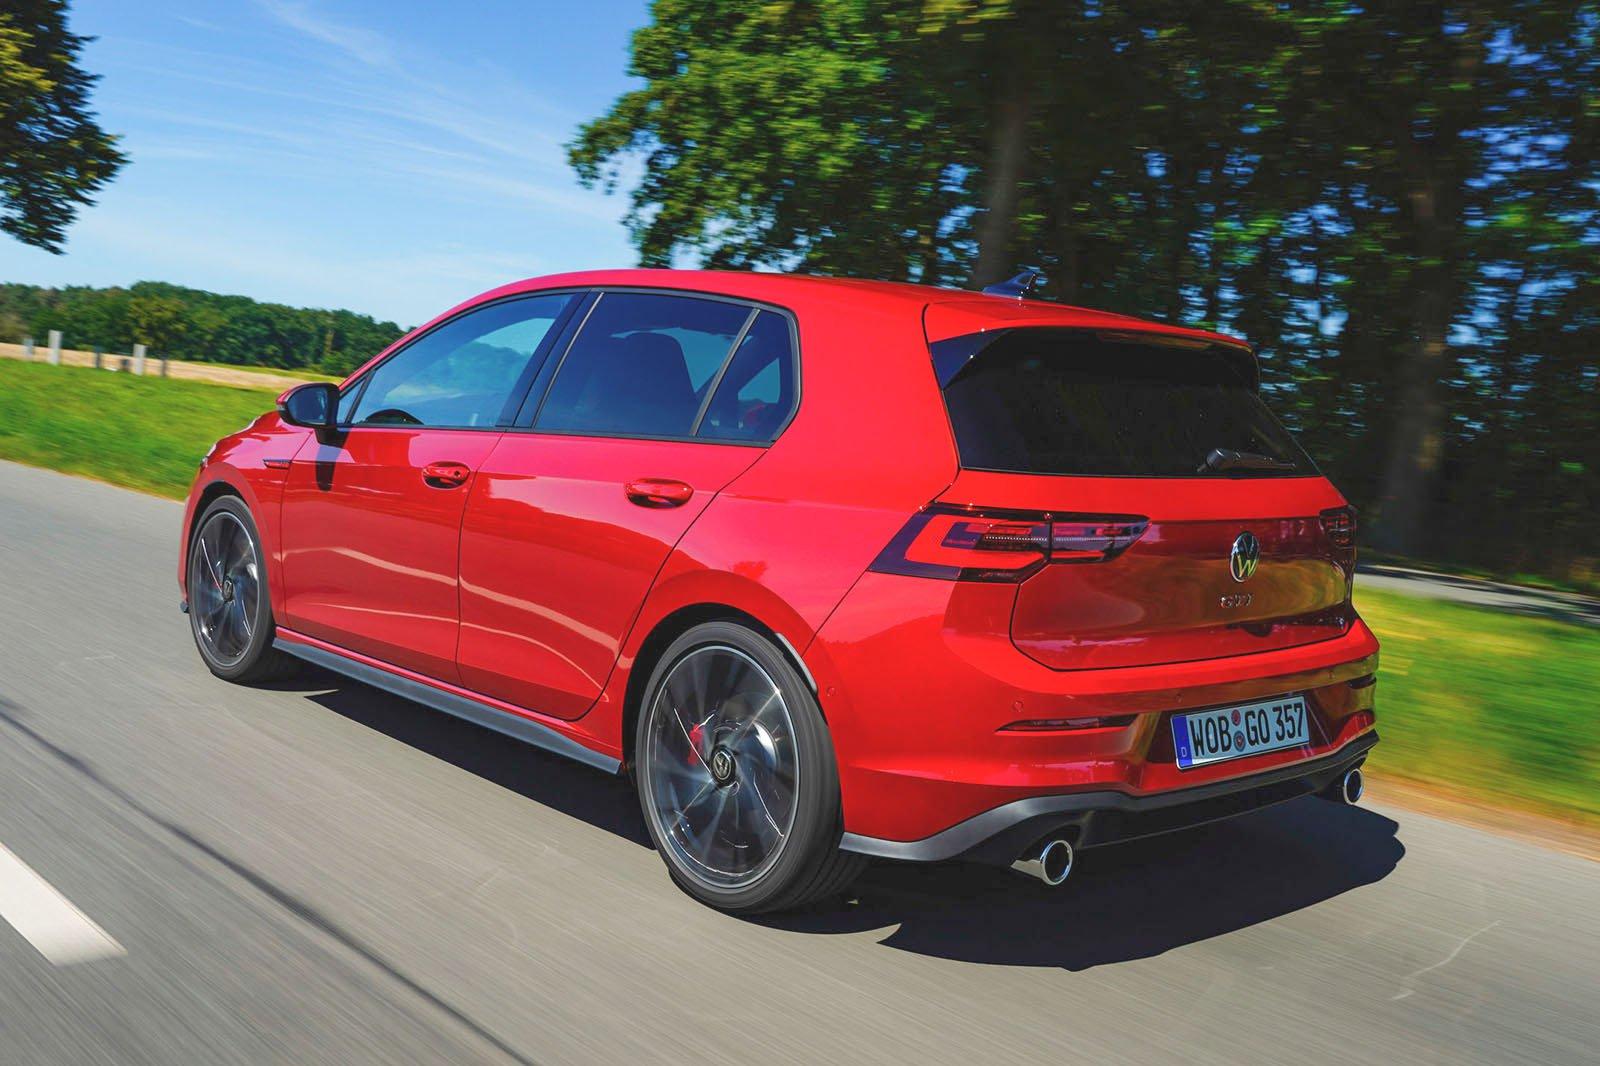 2020 Volkswagen Golf GTI rear corner driving